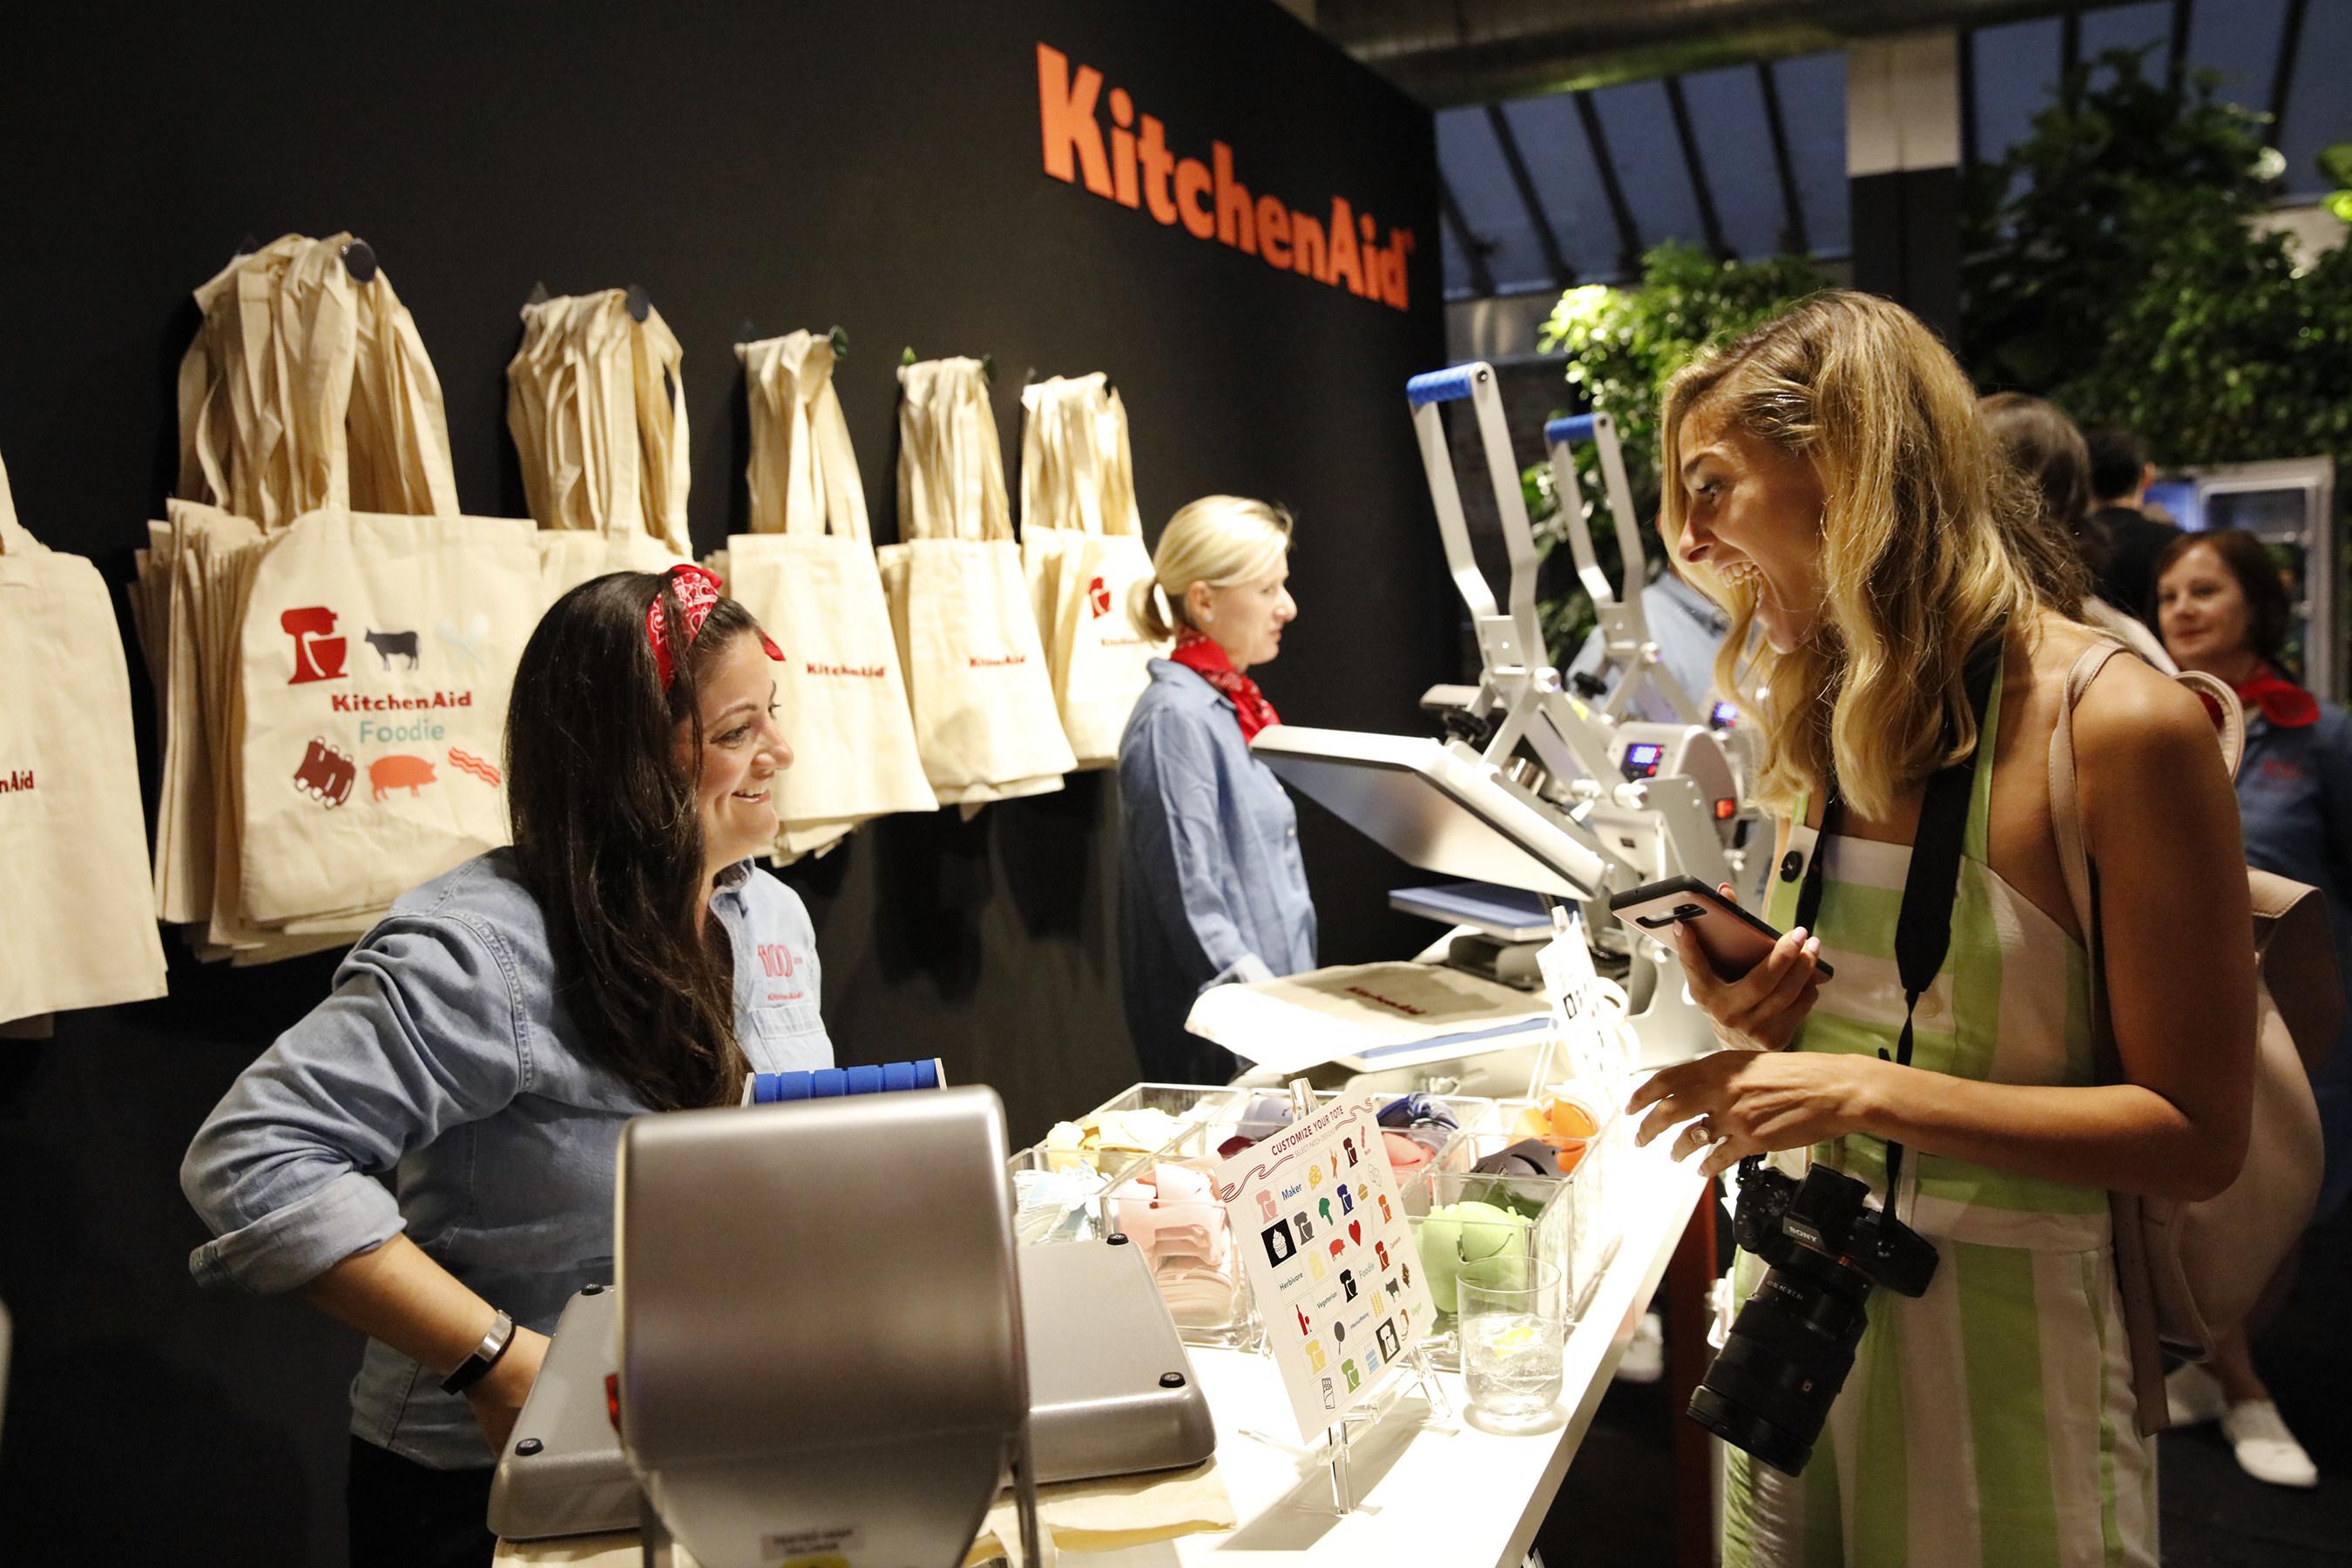 KitchenAid Brand Opens Pop-Up Culinary Playground to ...